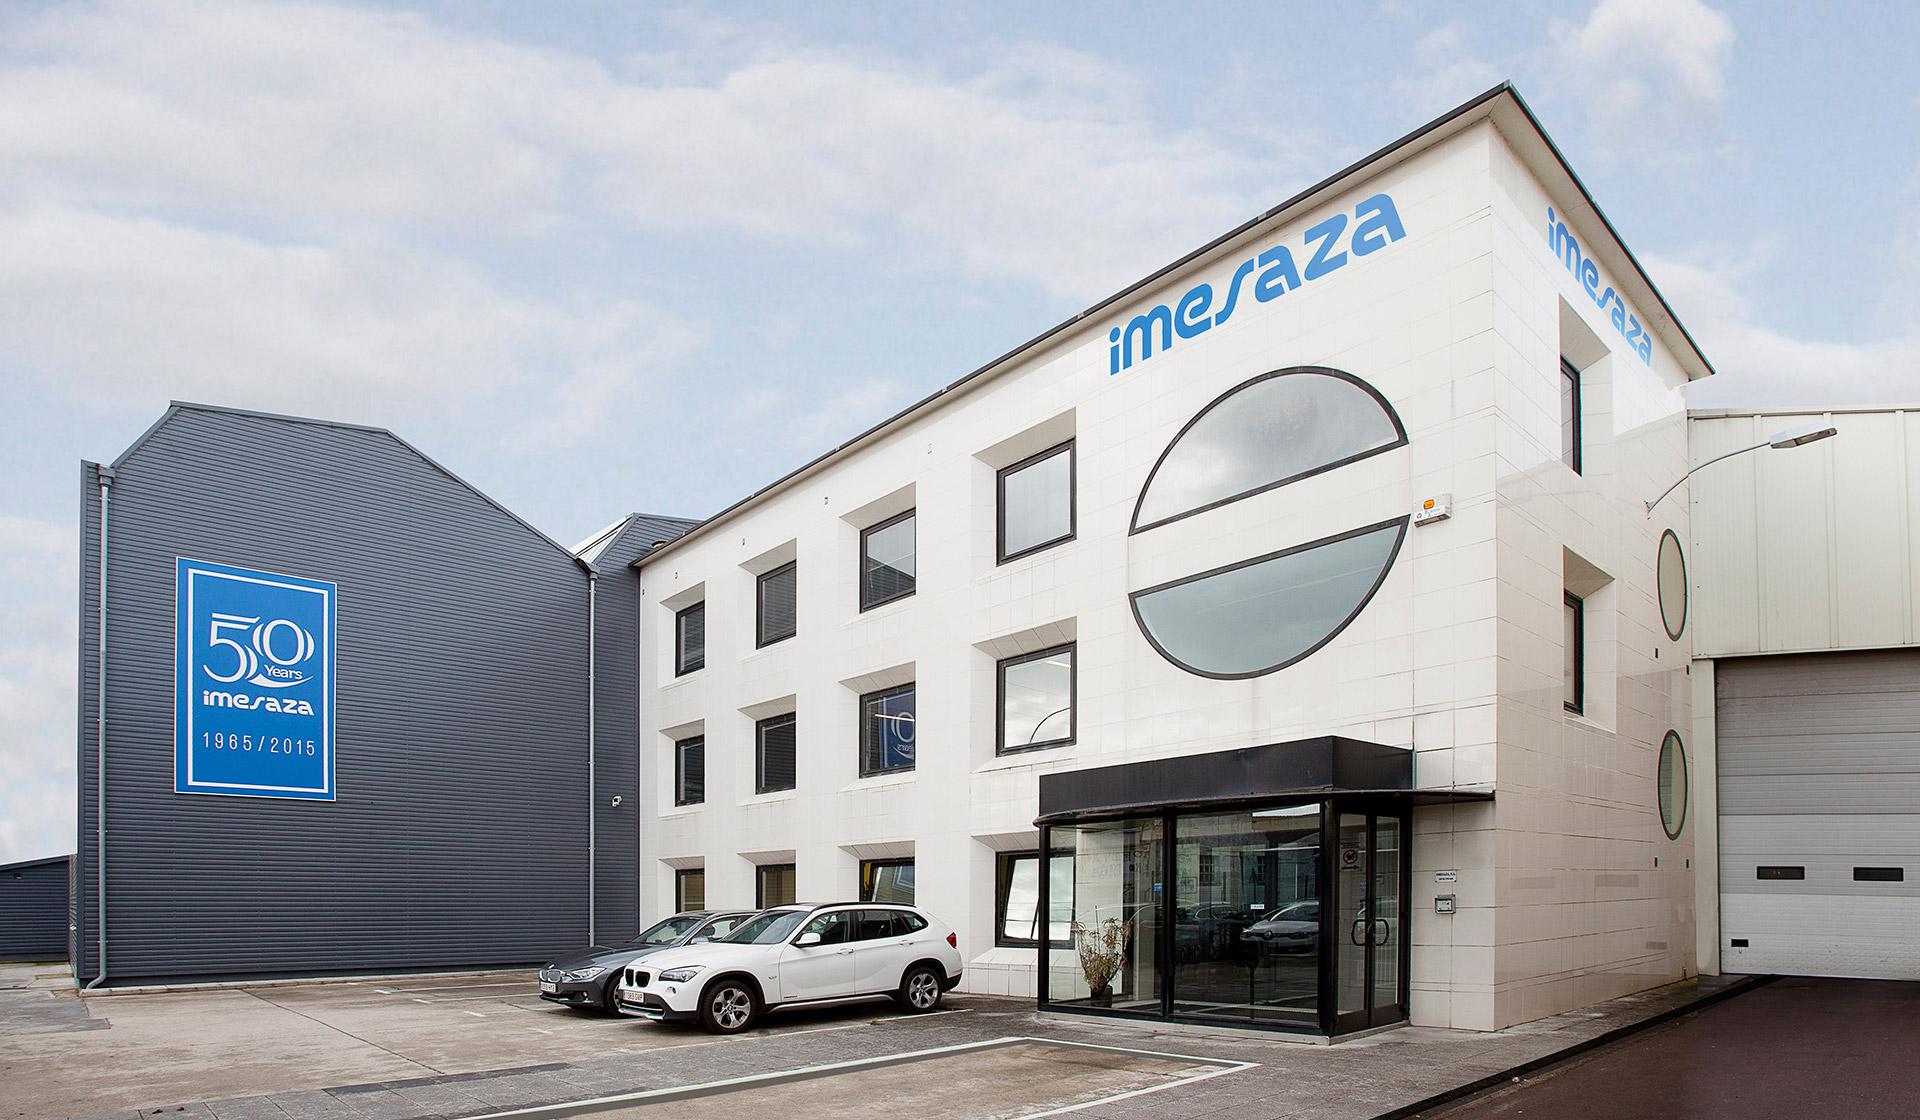 Instalaciones Imesaza